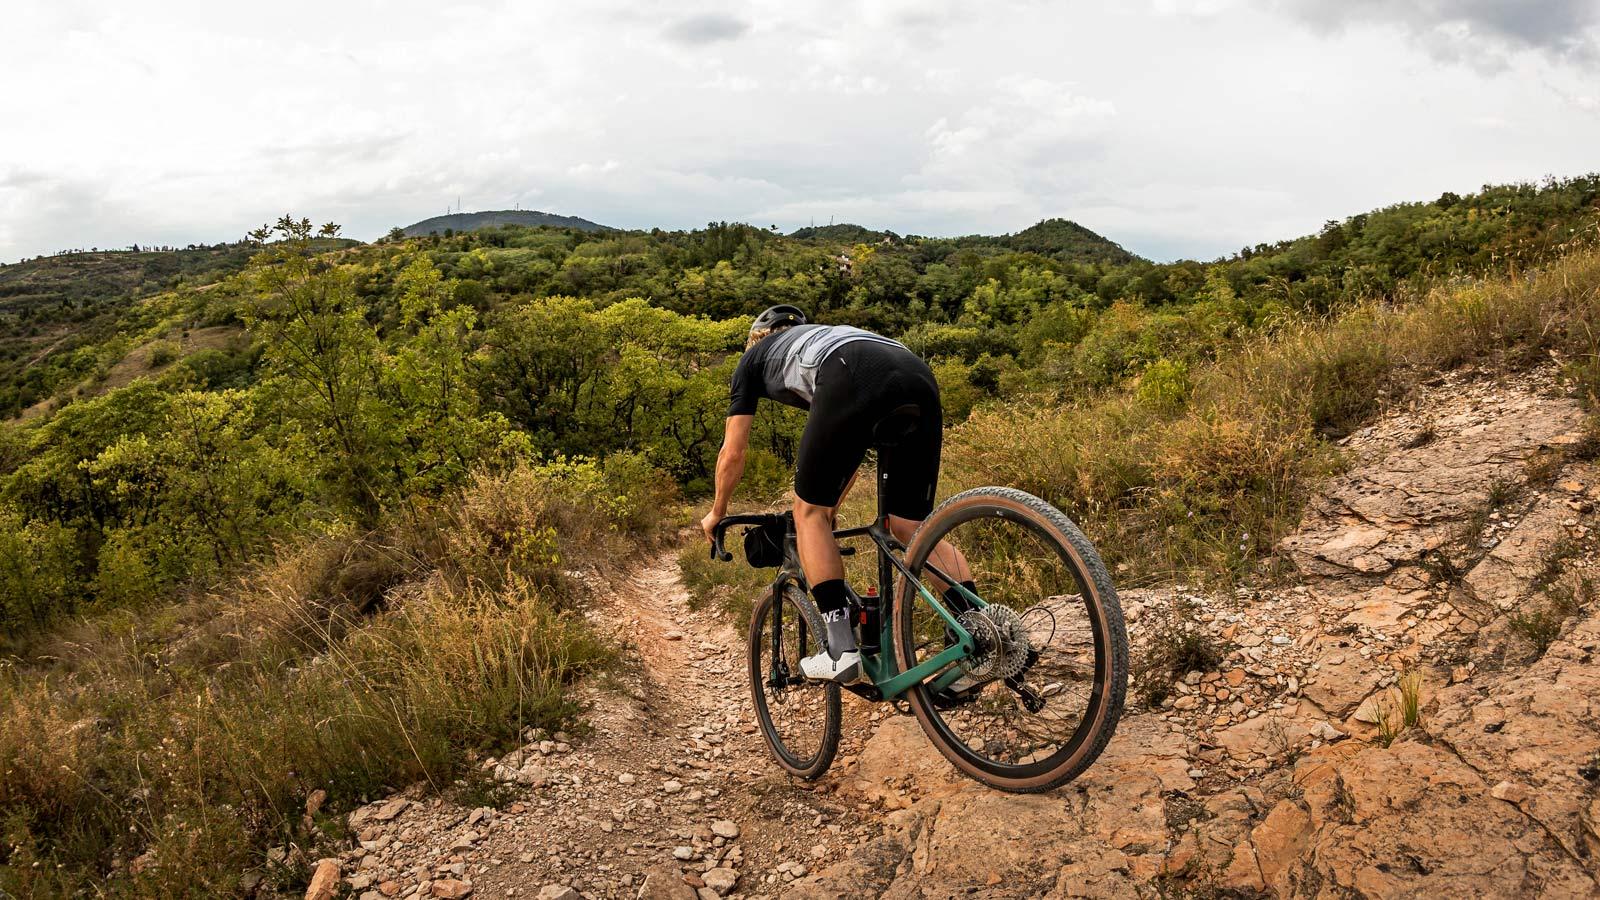 Fulcrum Rapid Red Carbon lightweight asymmetric tubeless gravel bike wheels,off-road